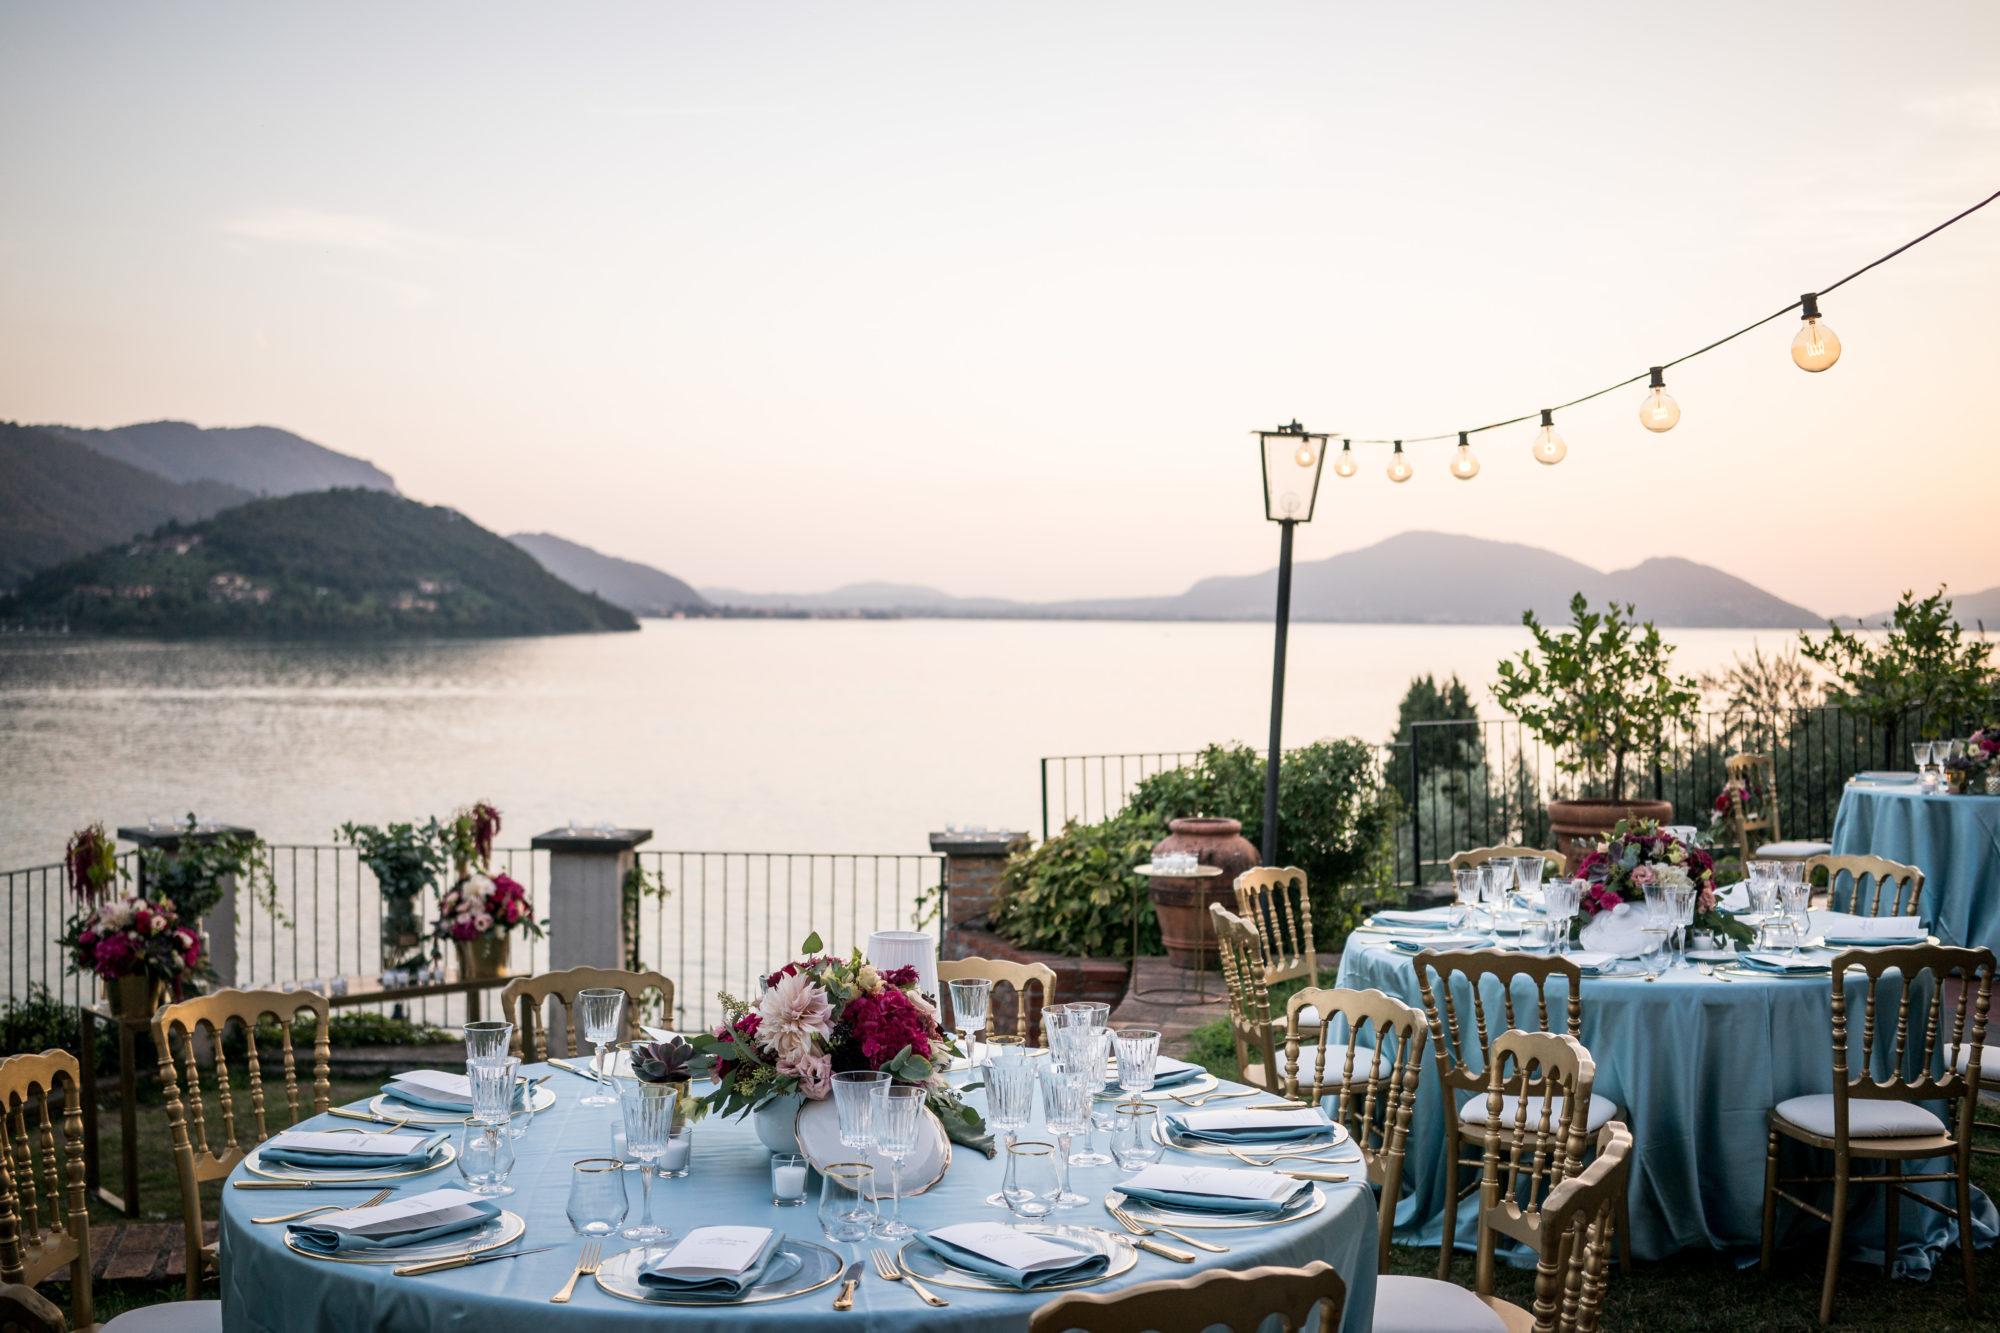 0026_gilberti_ricca_castello_oldofredi_montisola_fotografi_matrimonio